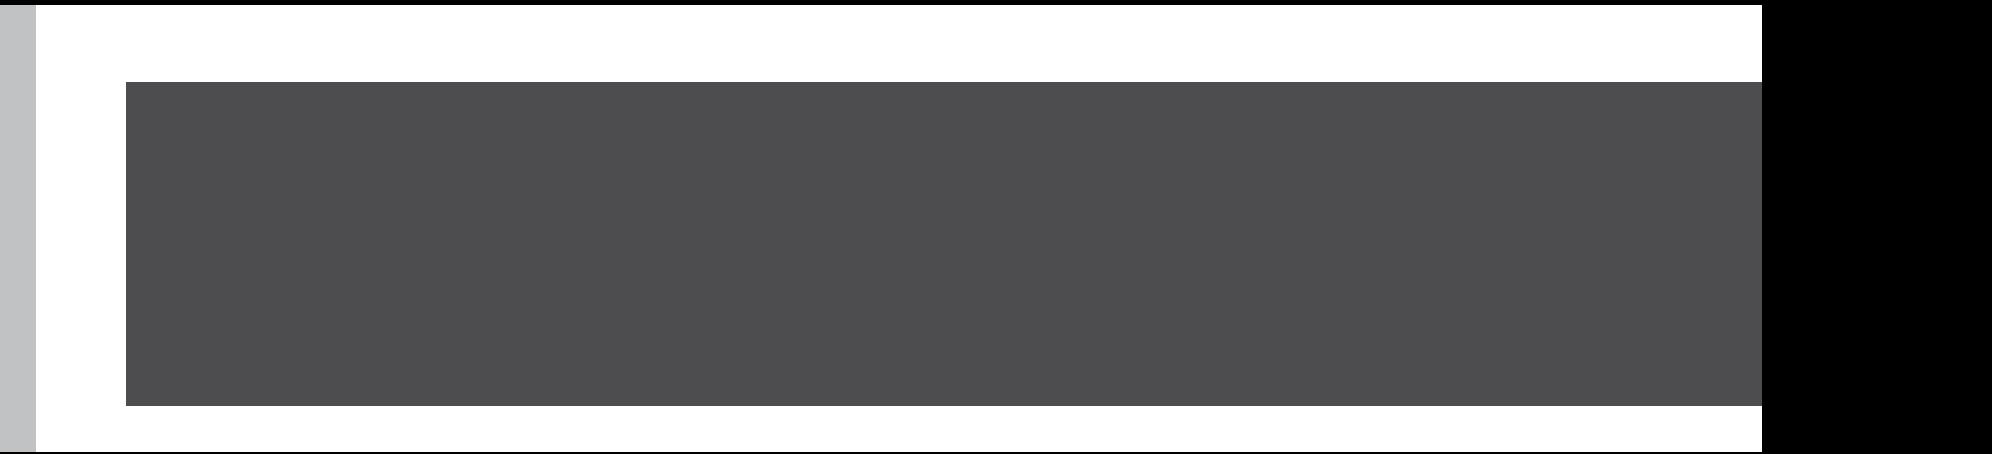 College of Environmental Design